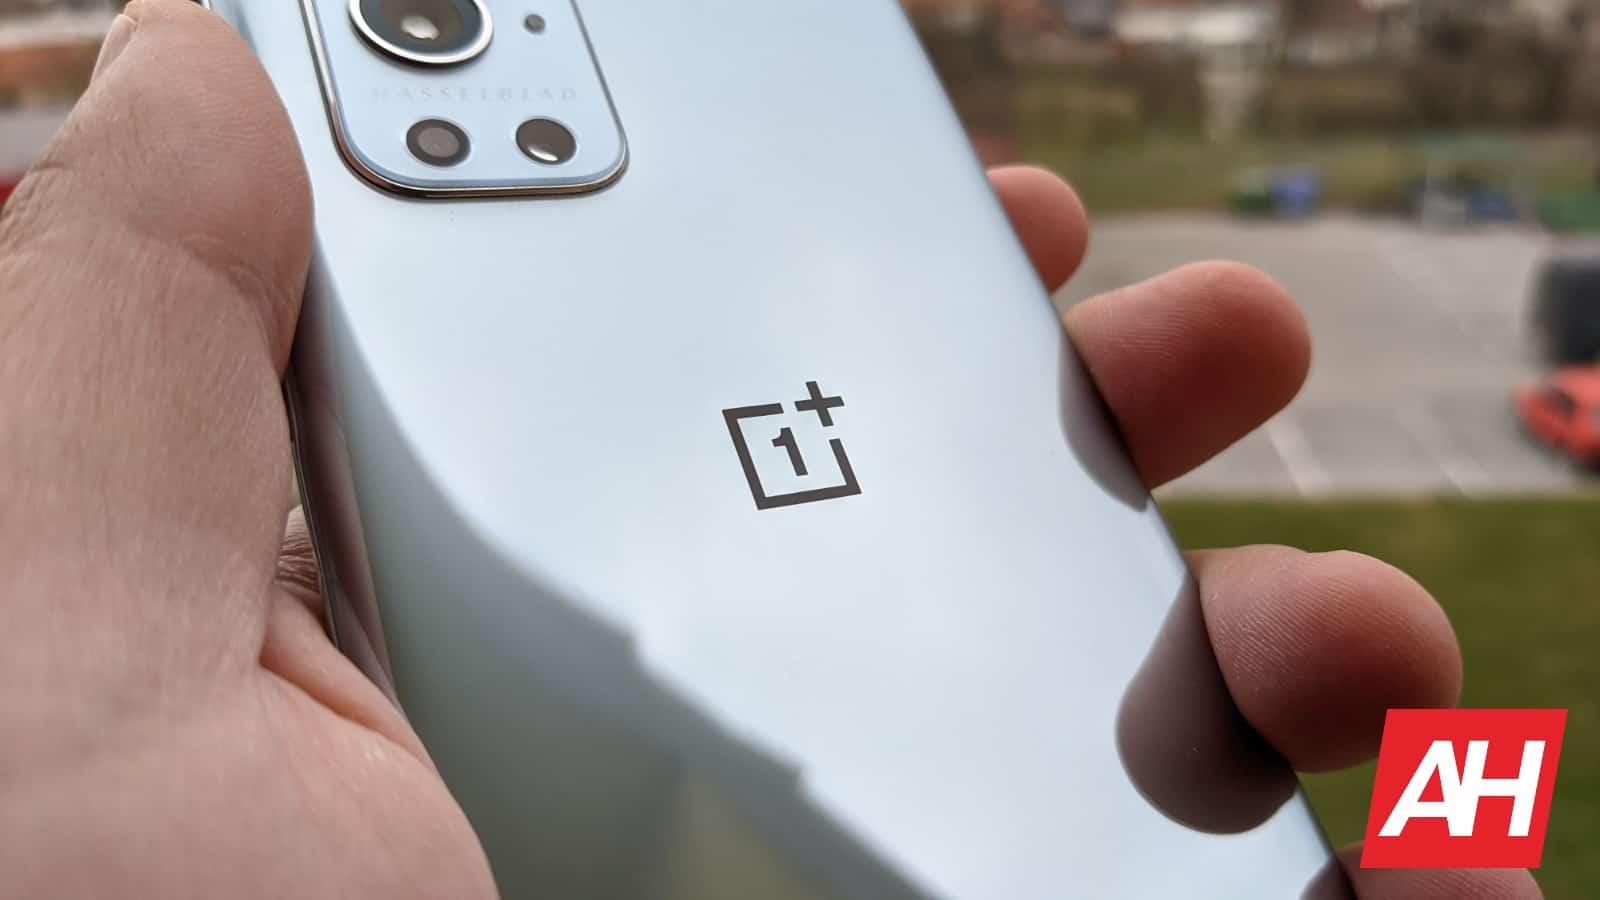 AH OnePlus 9 Pro KL image 25